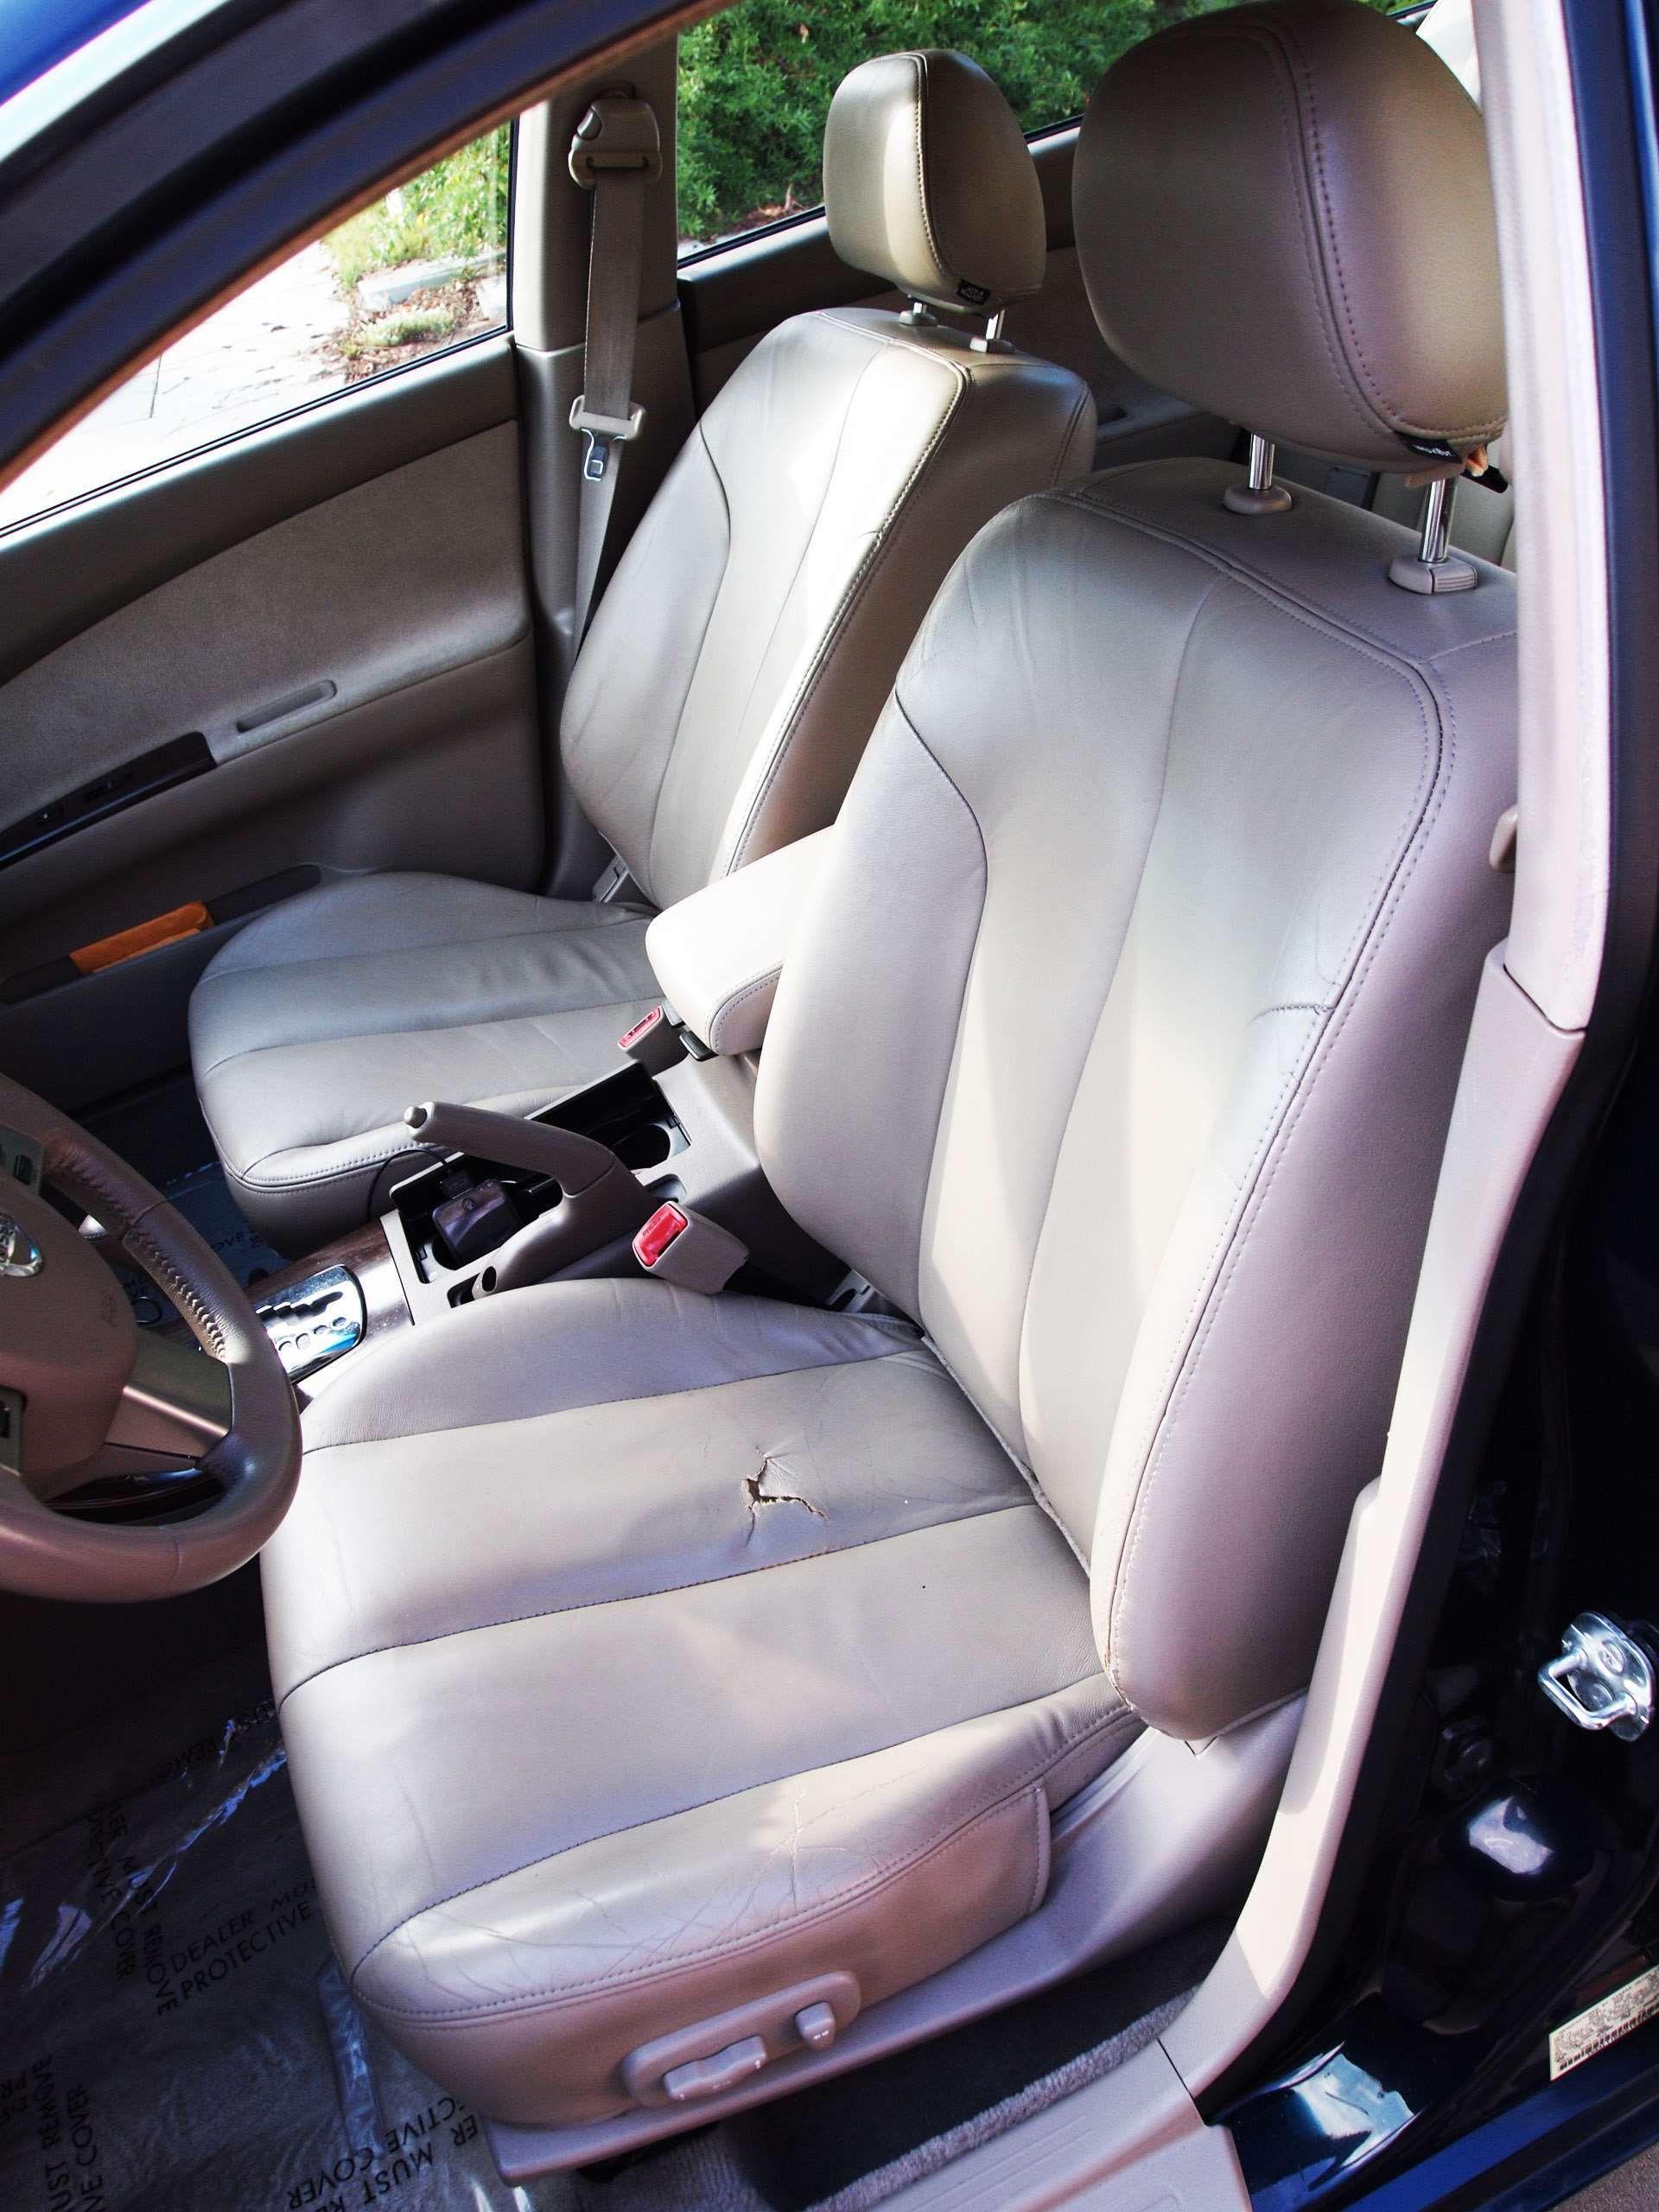 Make nissan model altima year 2005 body style sedan exterior color